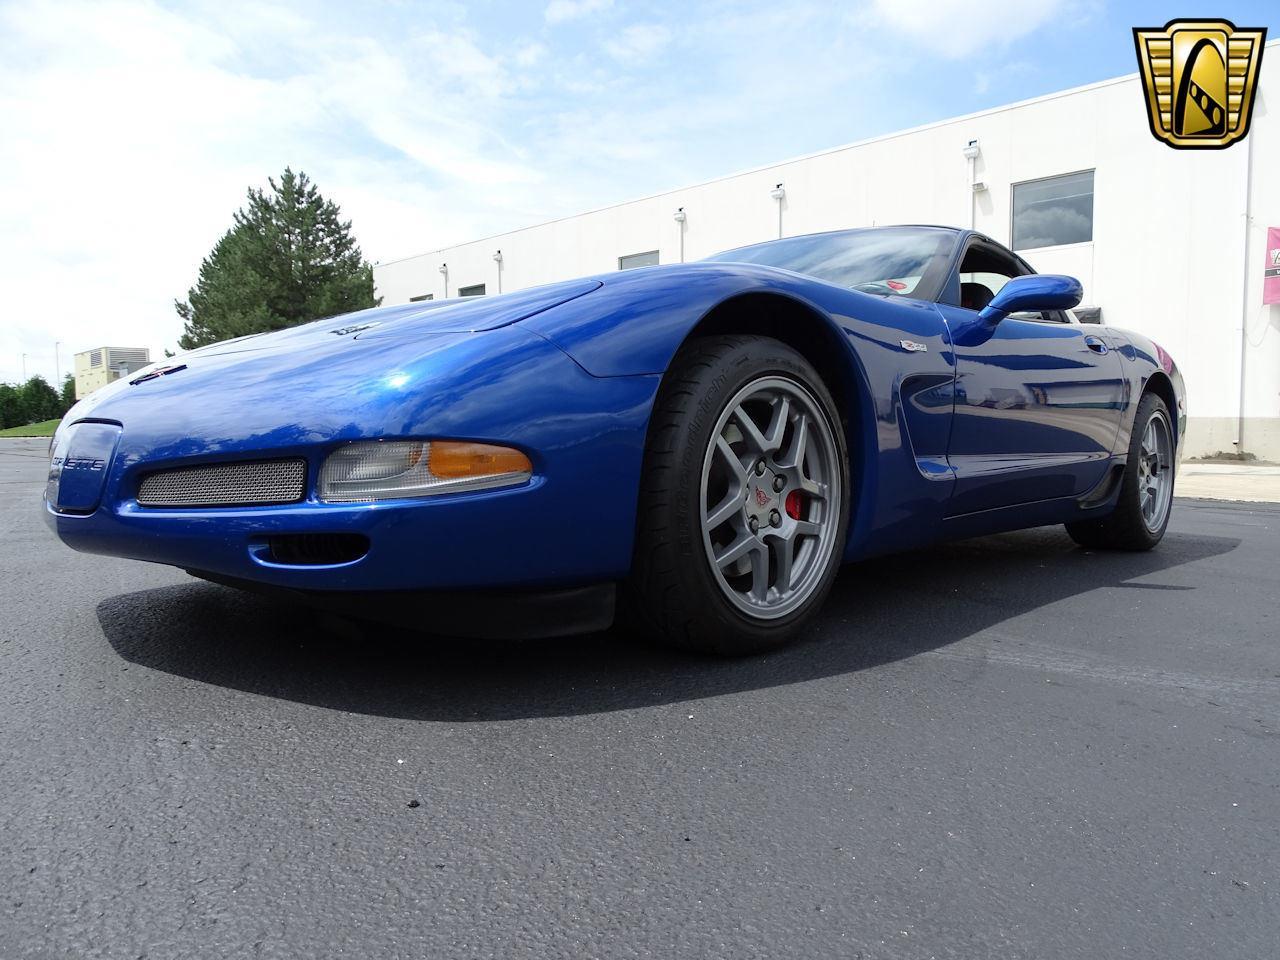 Large Picture of '02 Chevrolet Corvette - $29,595.00 - LCNV